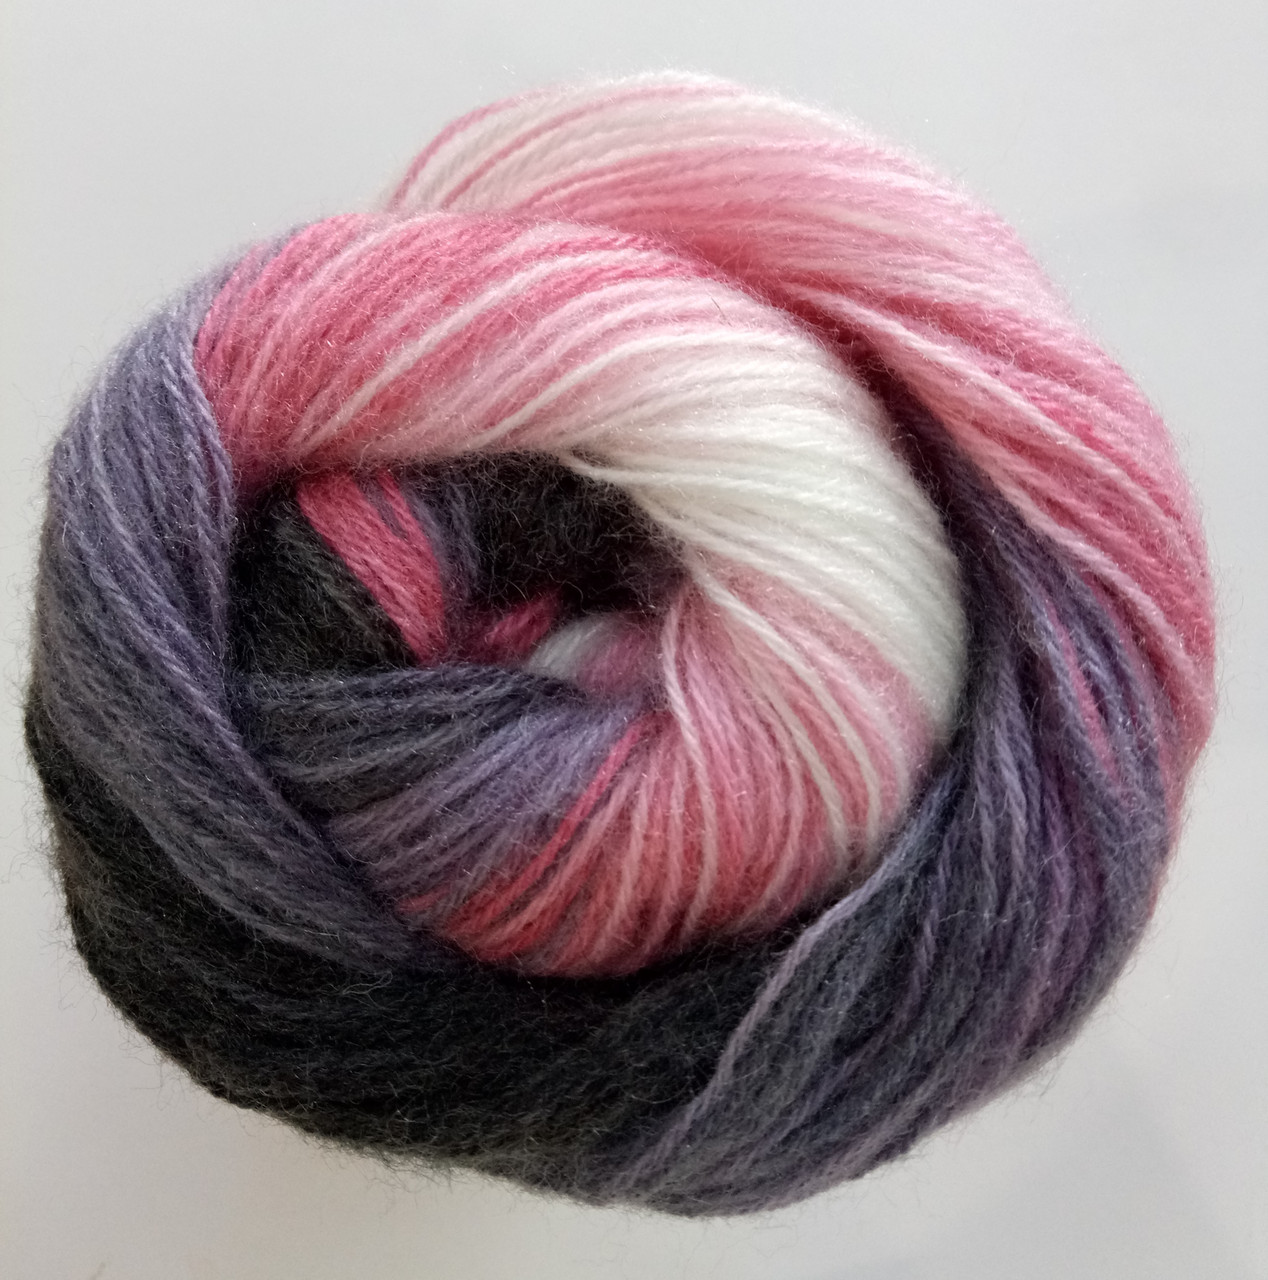 купить пряжа для вязания ангора голд батик Alize код 1602 доставка